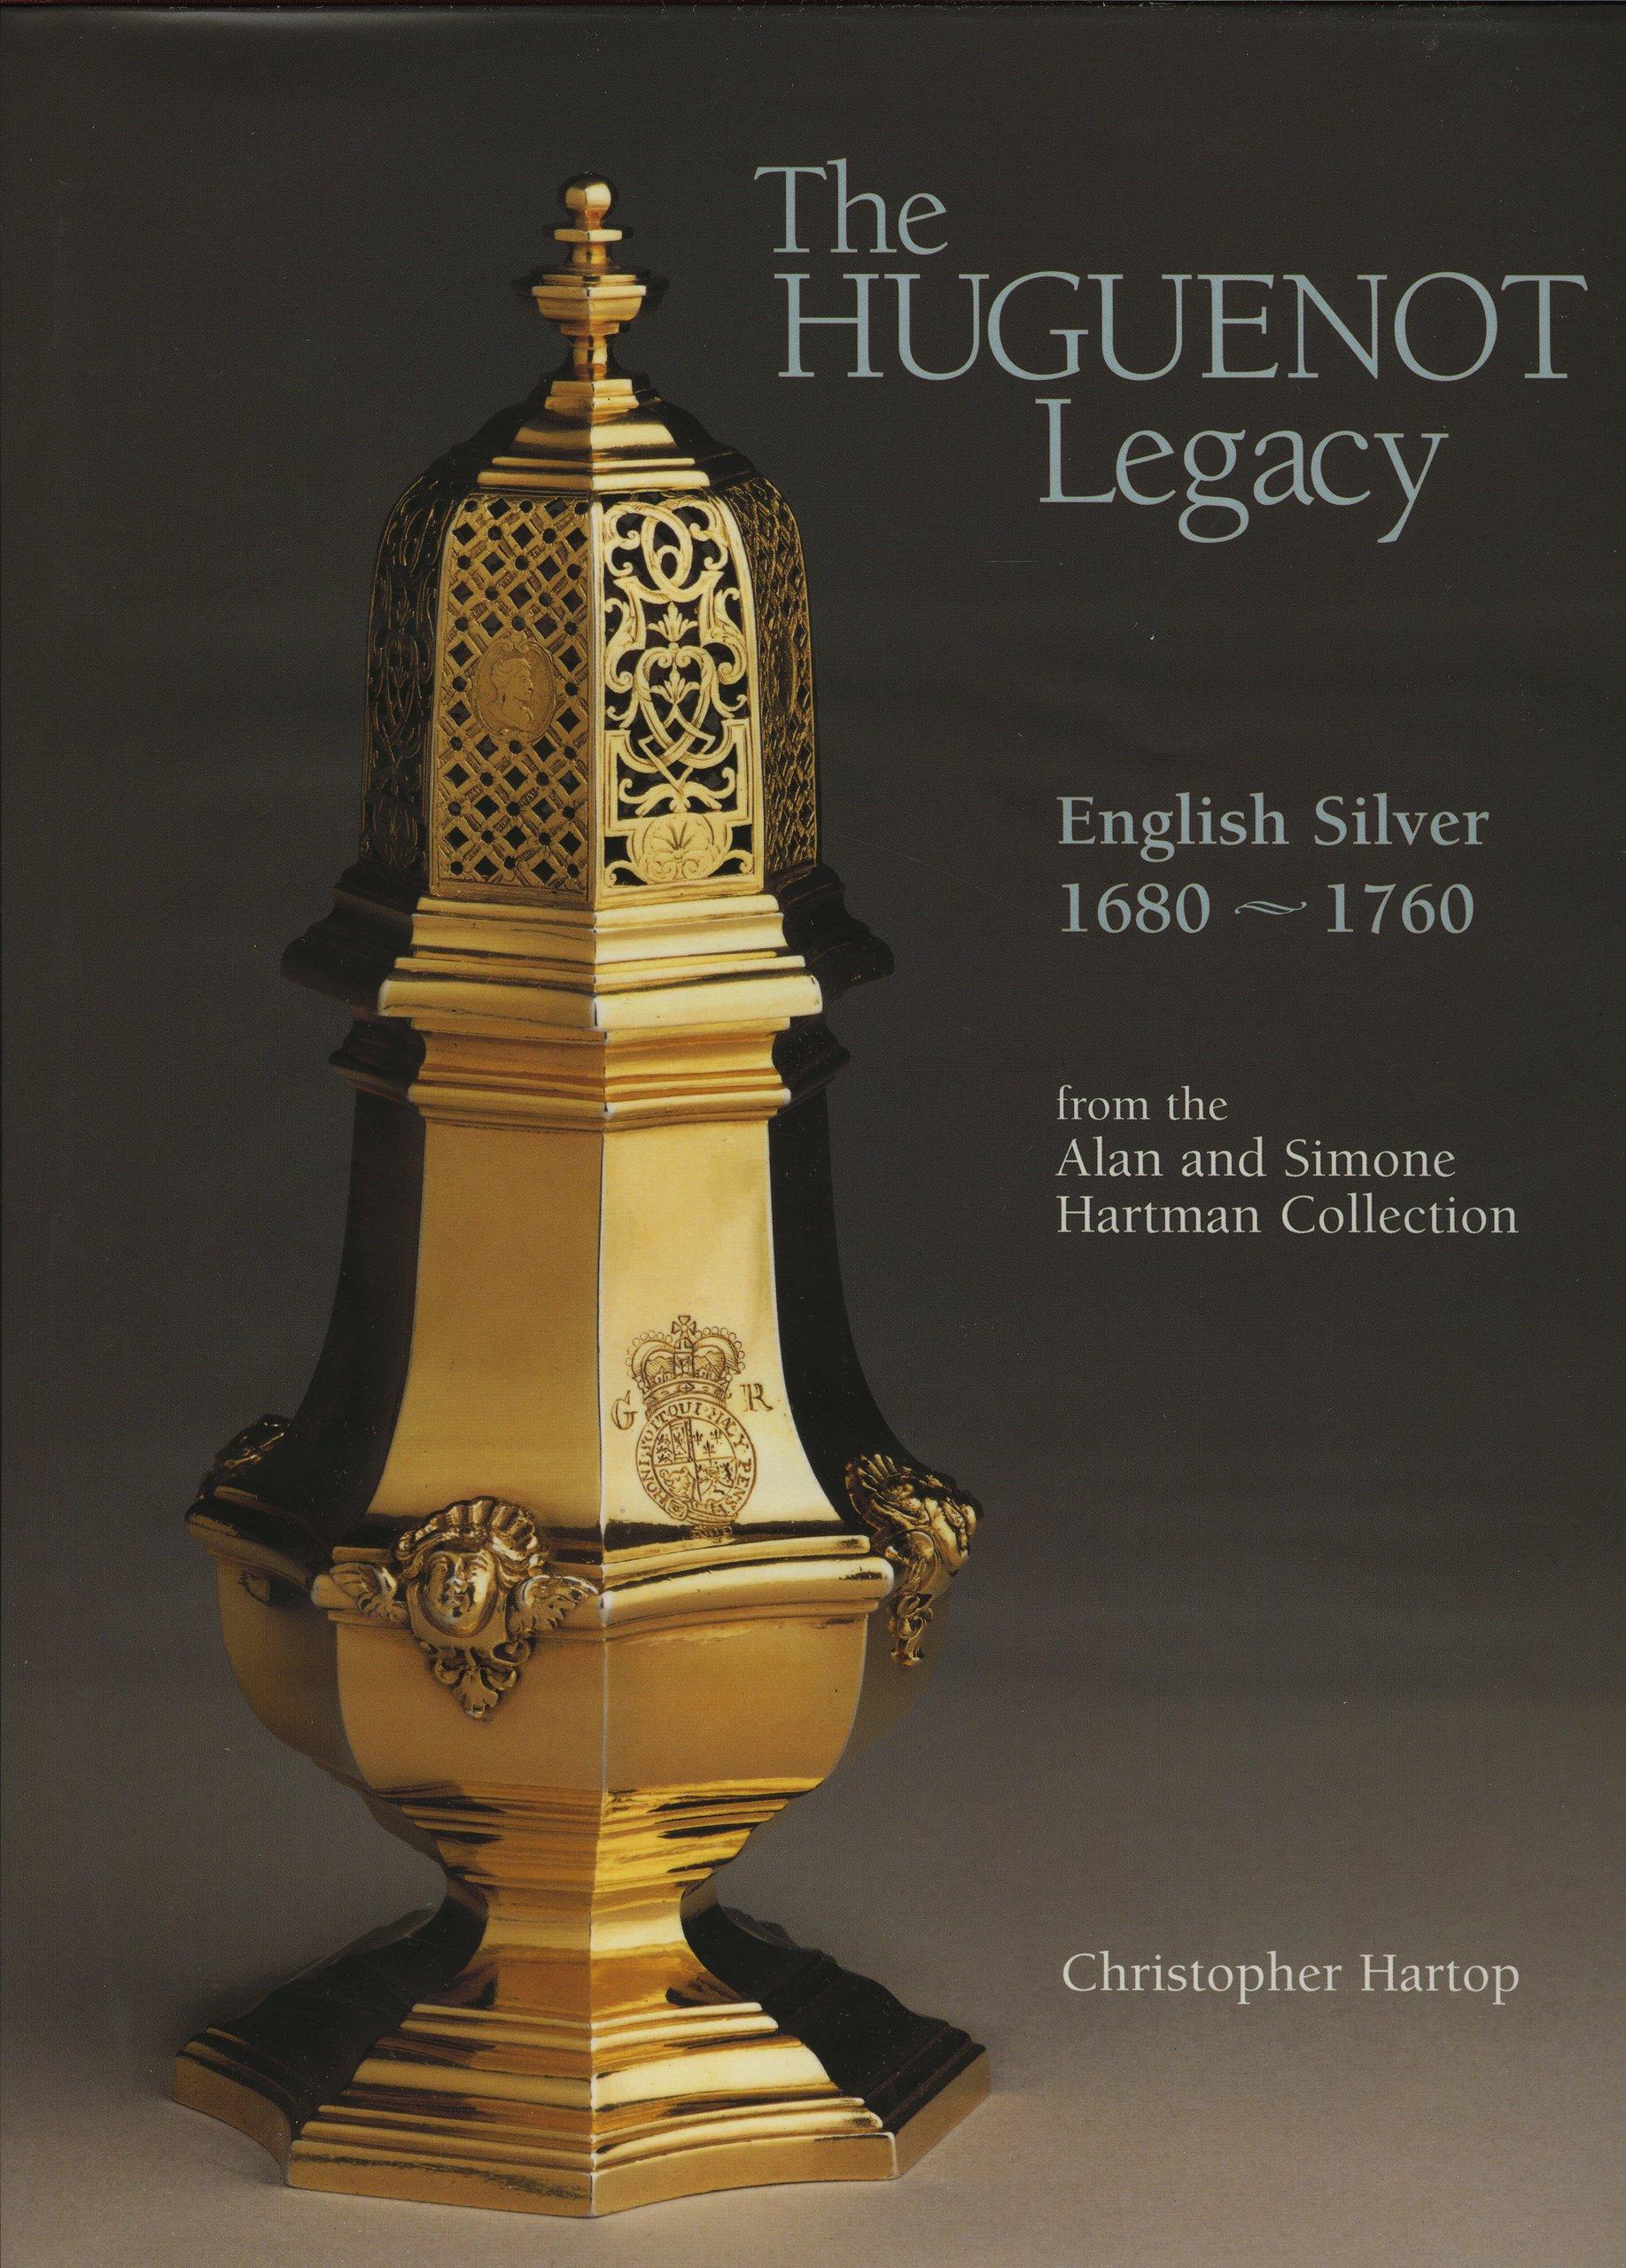 The Huguenot Legacy: English Silver 1680-1760